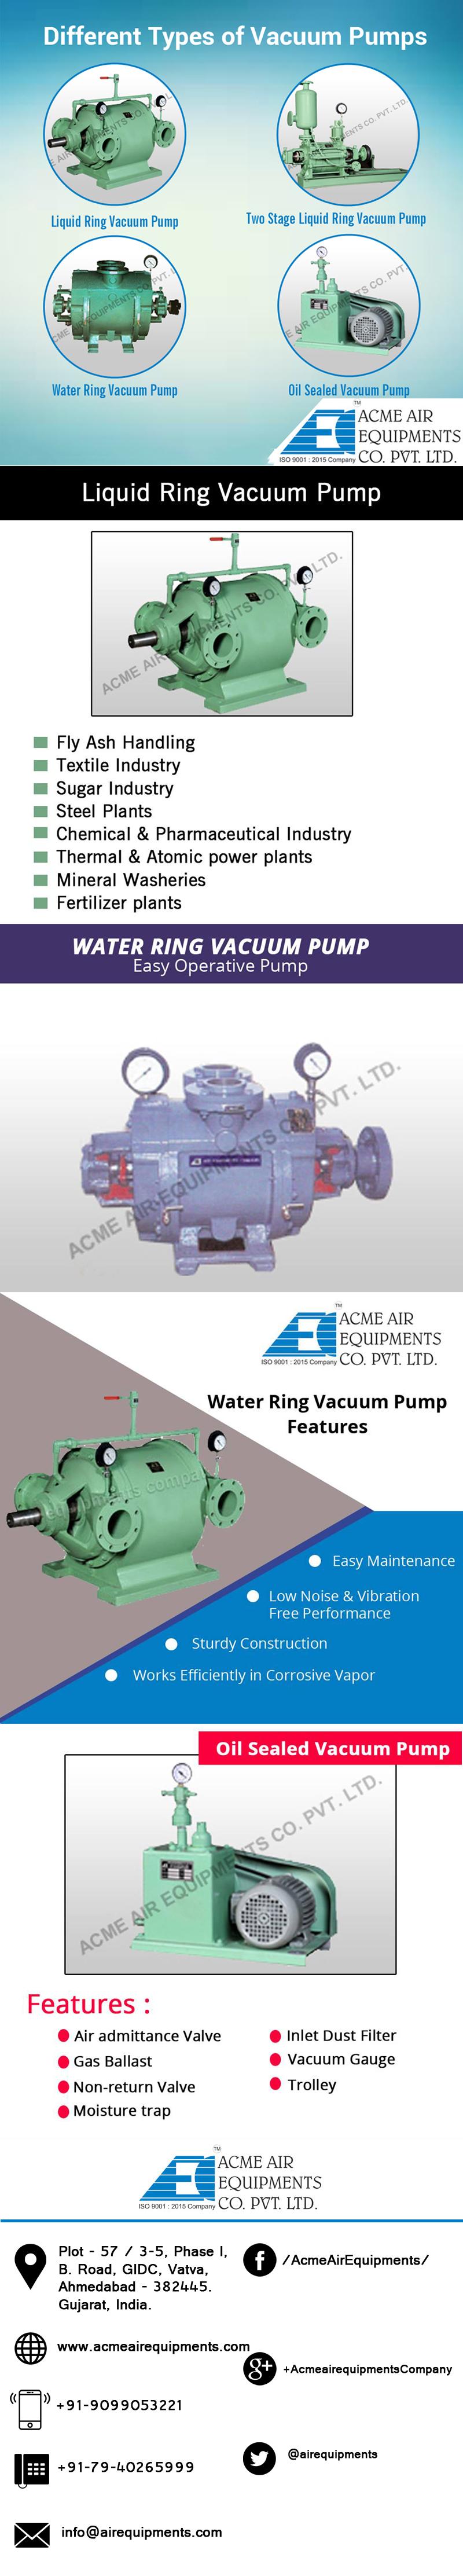 Vacuum Pump- Different Types & Applications